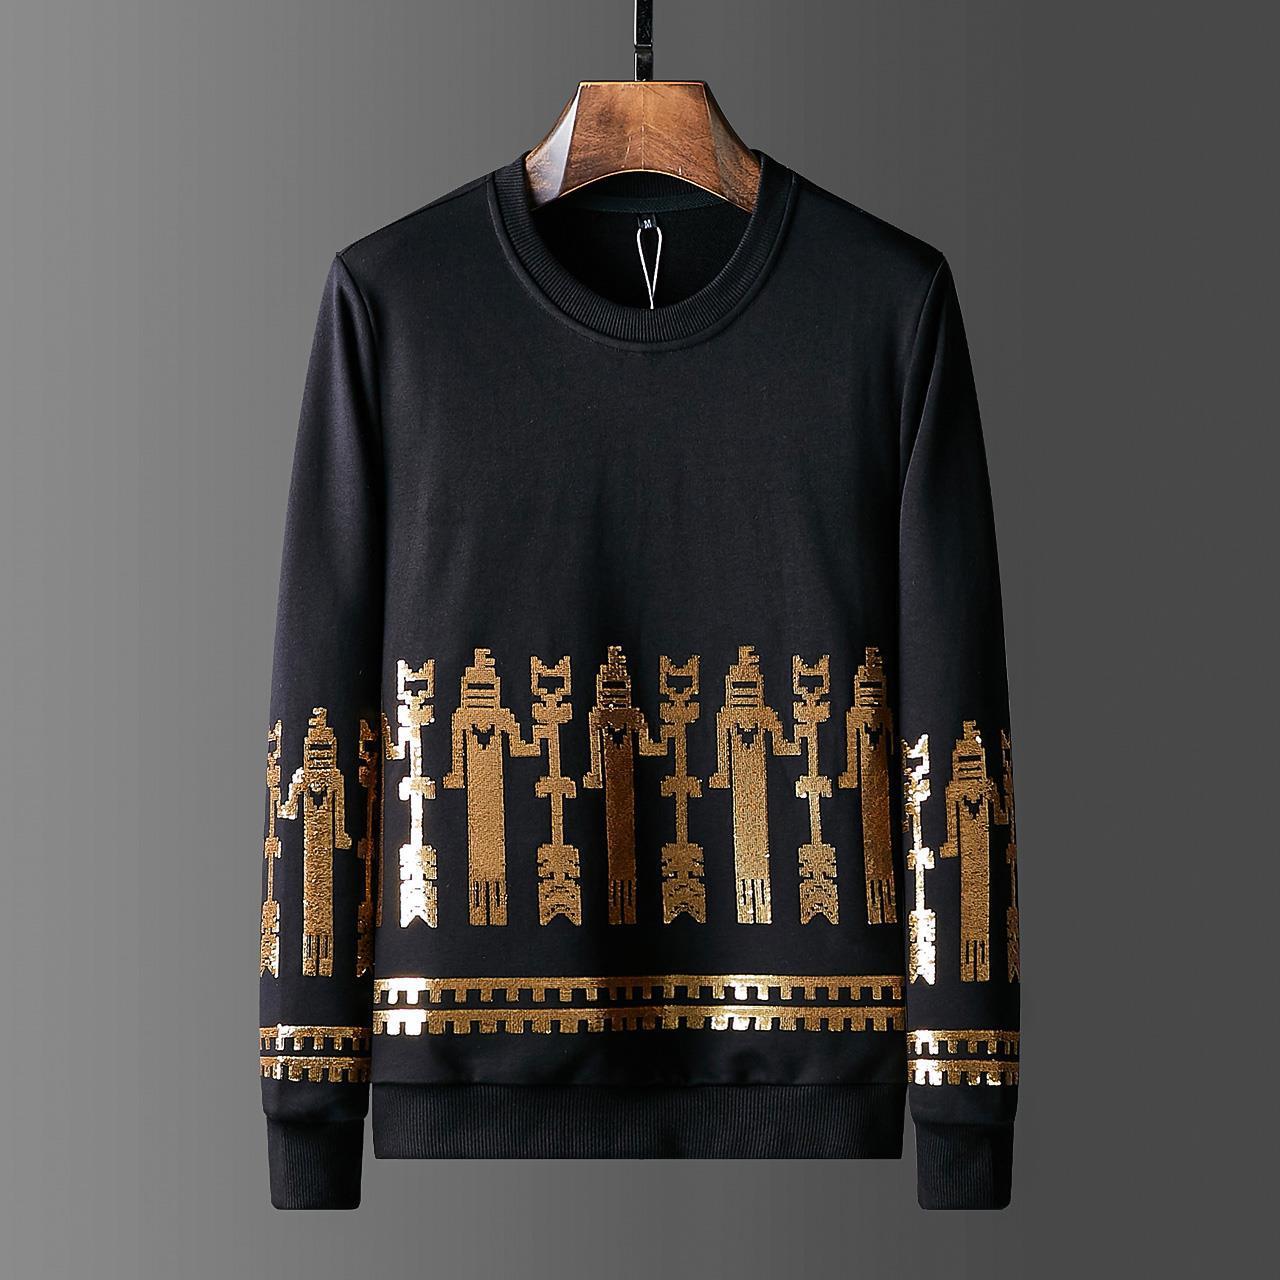 2019 Mens Autumn Clothing Gilding Sequined Hoodies Full Pullover Sweatshirts Casual Streetwear Black Hoodie Men Ropa De Hombre